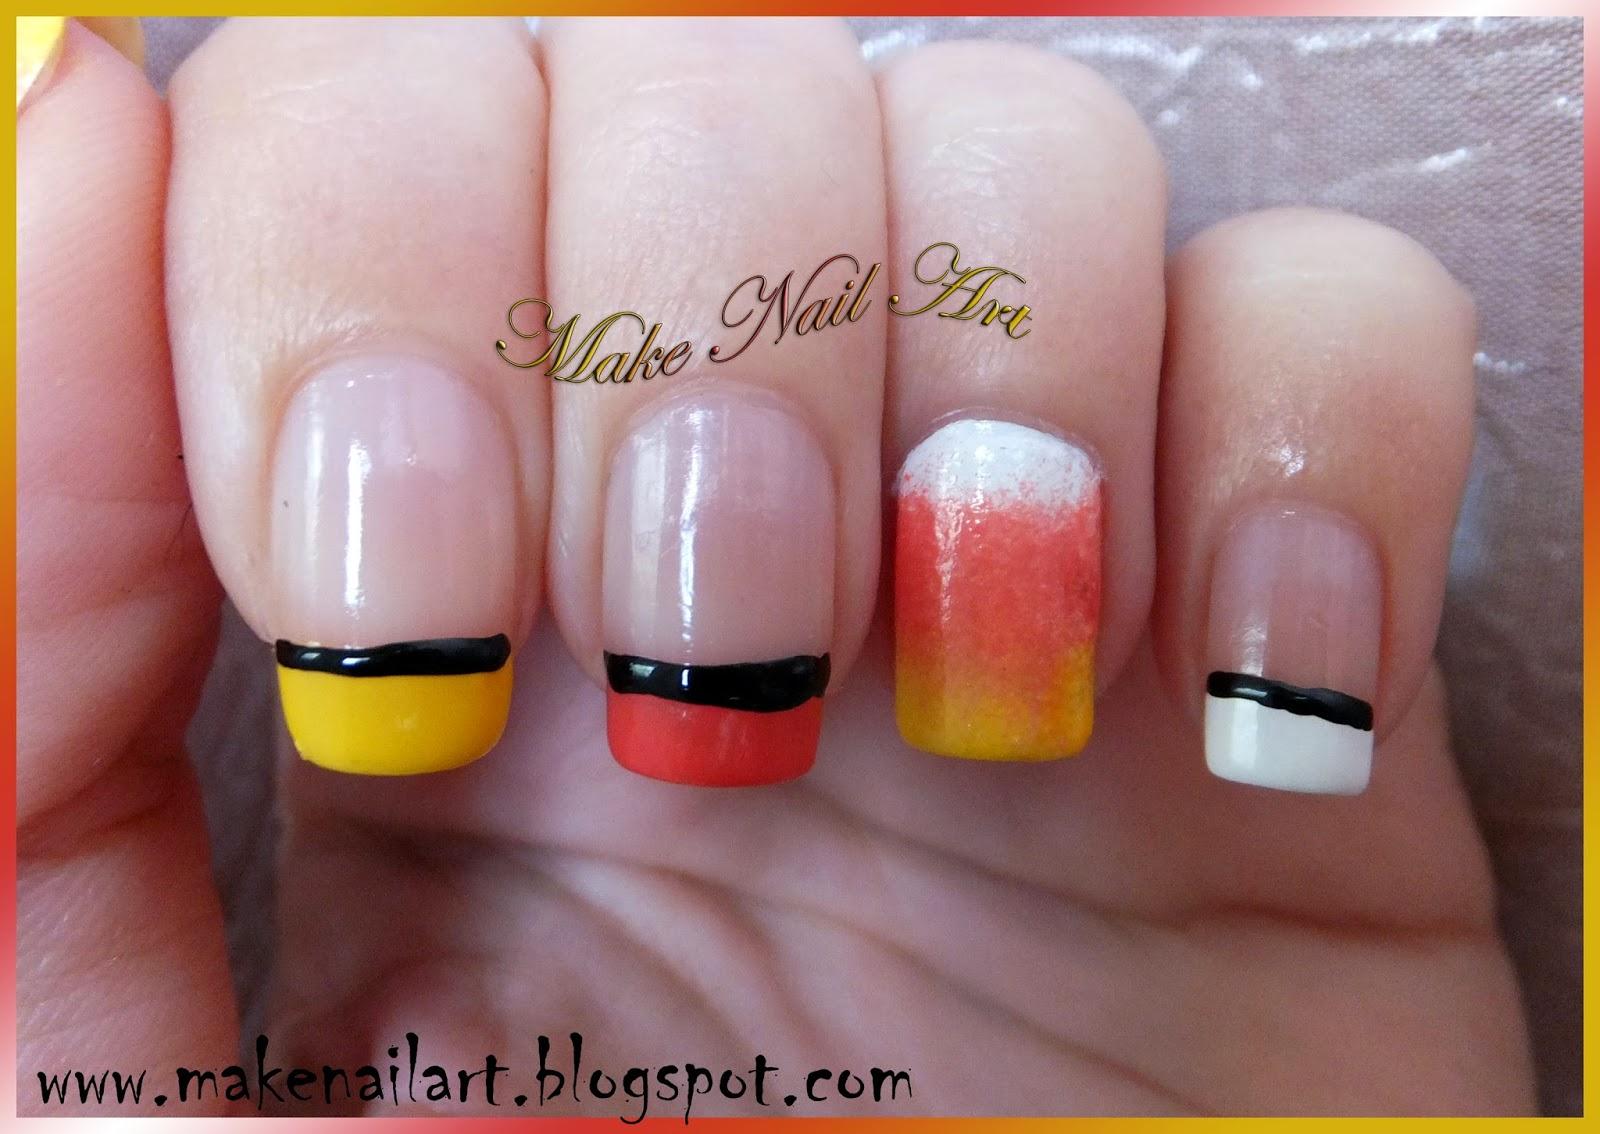 Make Nail Art Candy Corn Nail Art Tutorial For Halloween